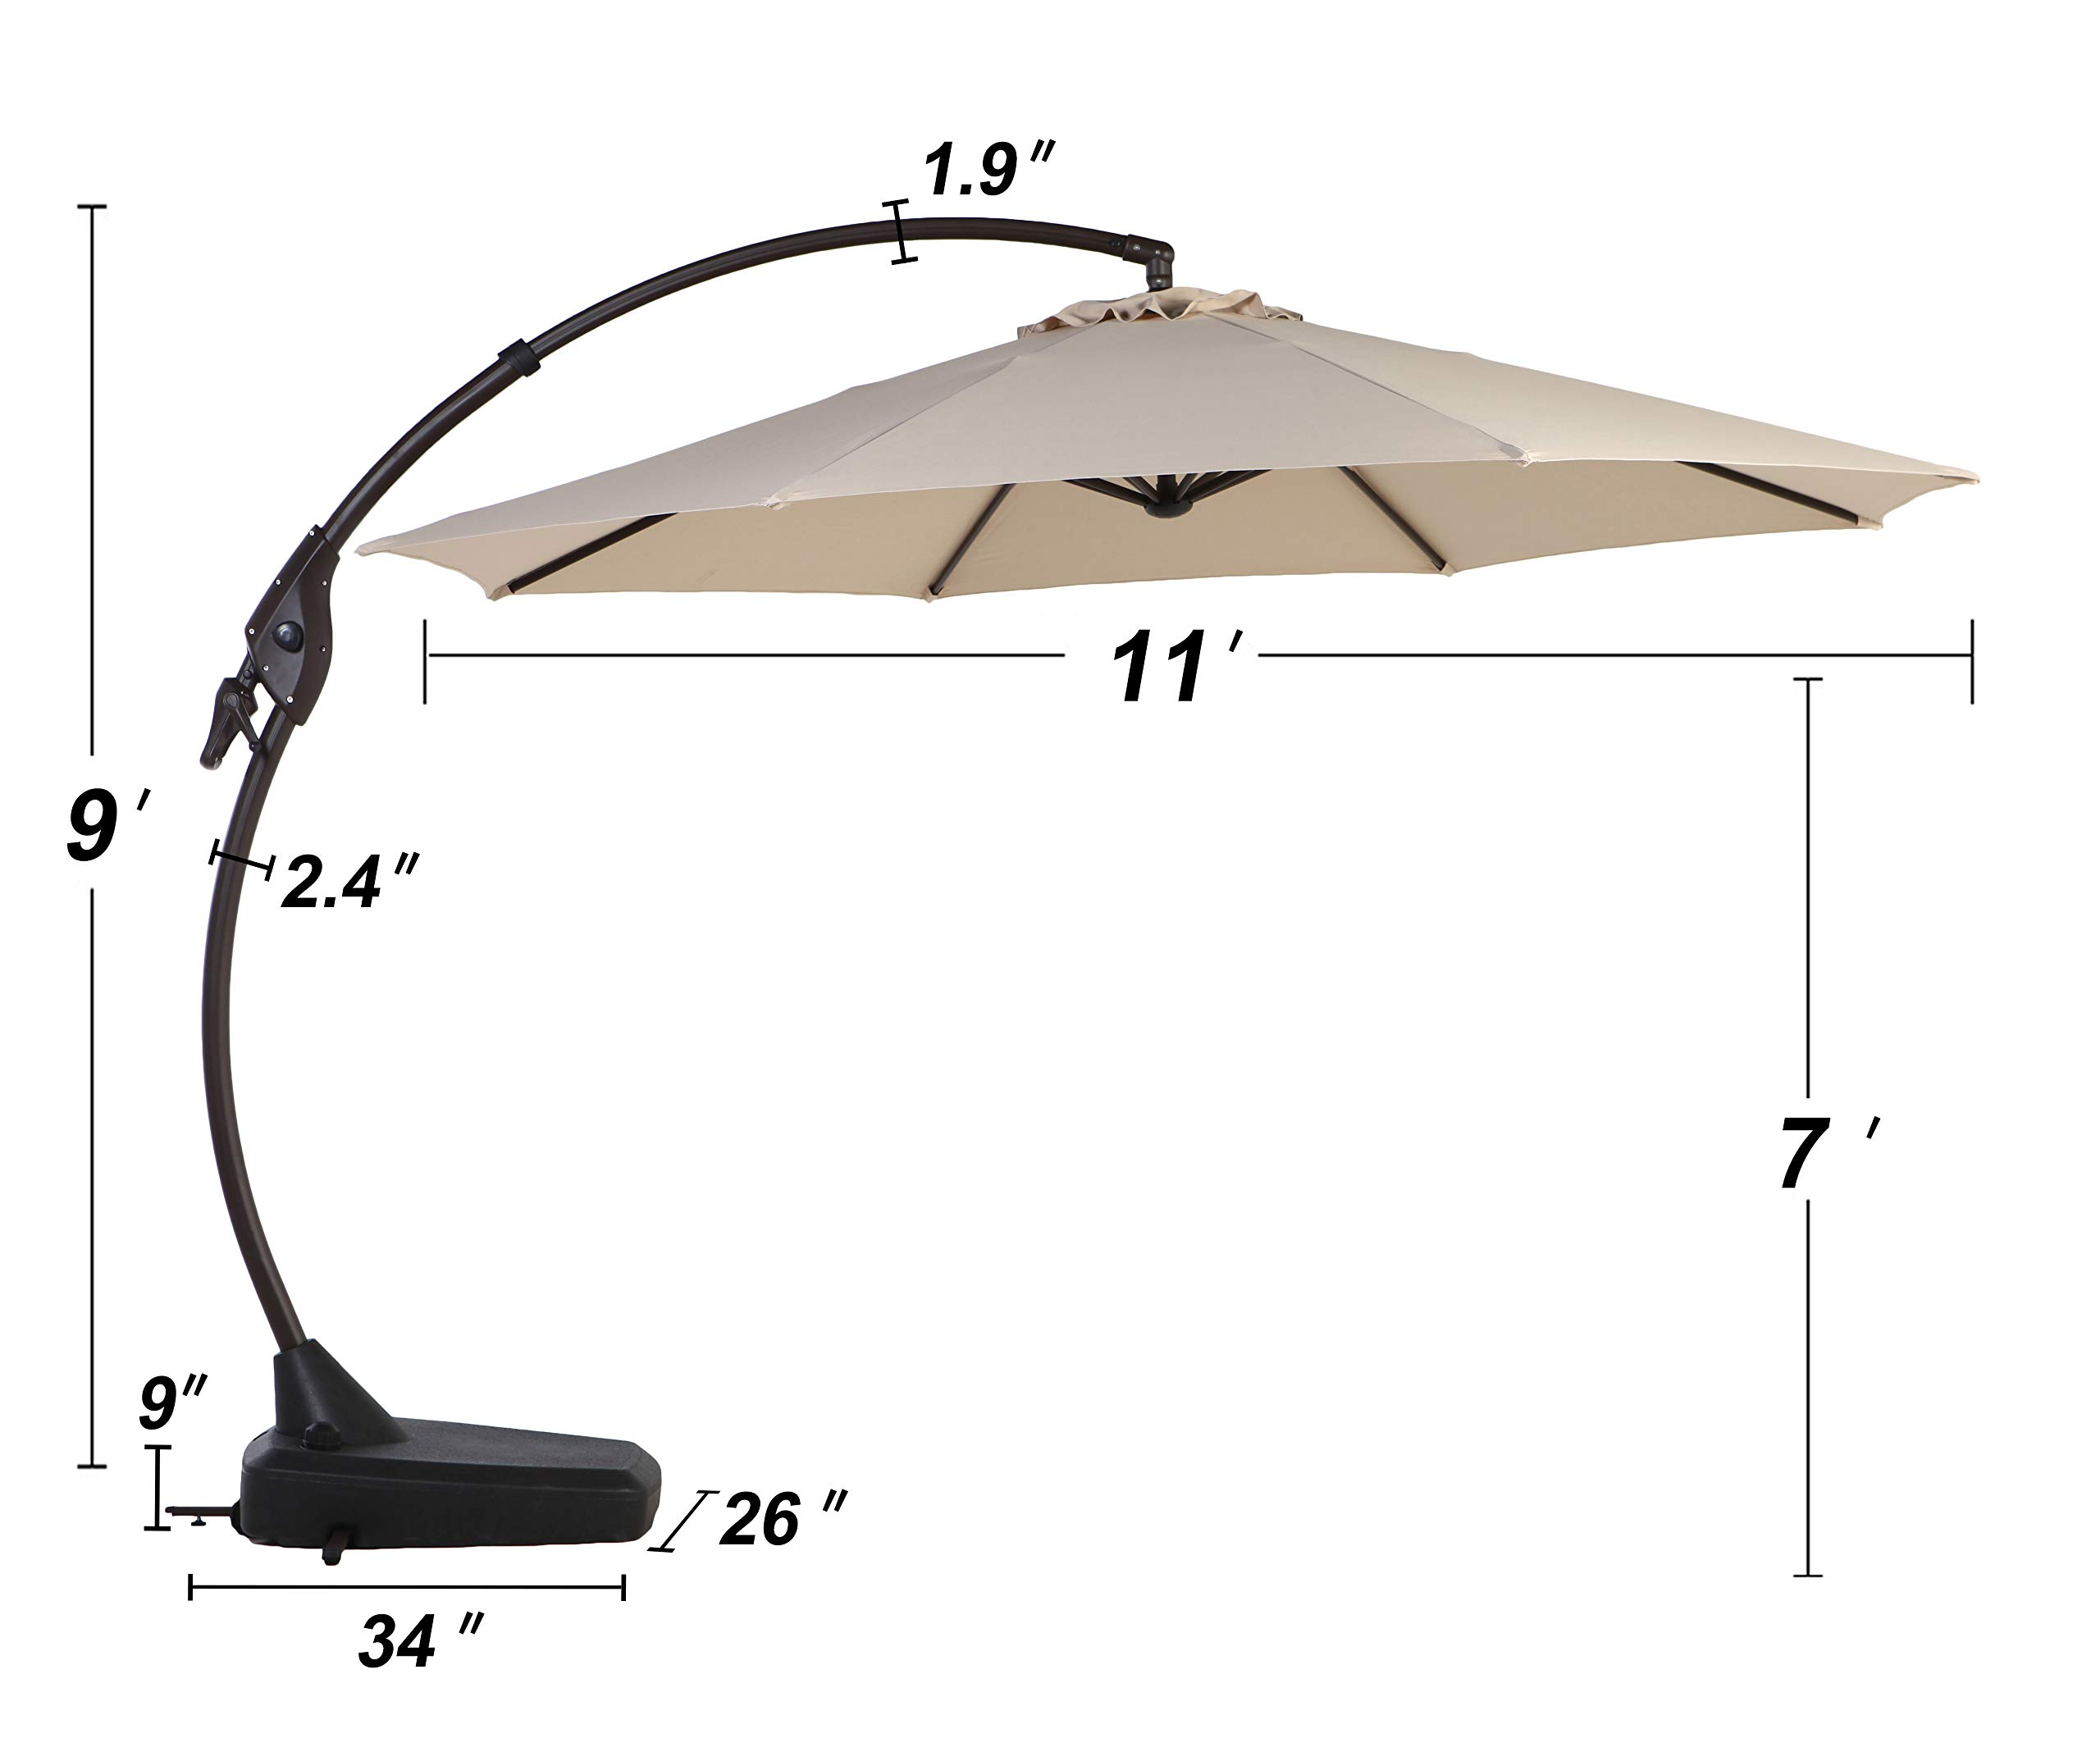 Grand Patio Napoli Deluxe 11 FT Curvy Aluminum Offset Umbrella, Patio Cantilever Umbrella with Base, Champagne by Grand Patio (Image #5)